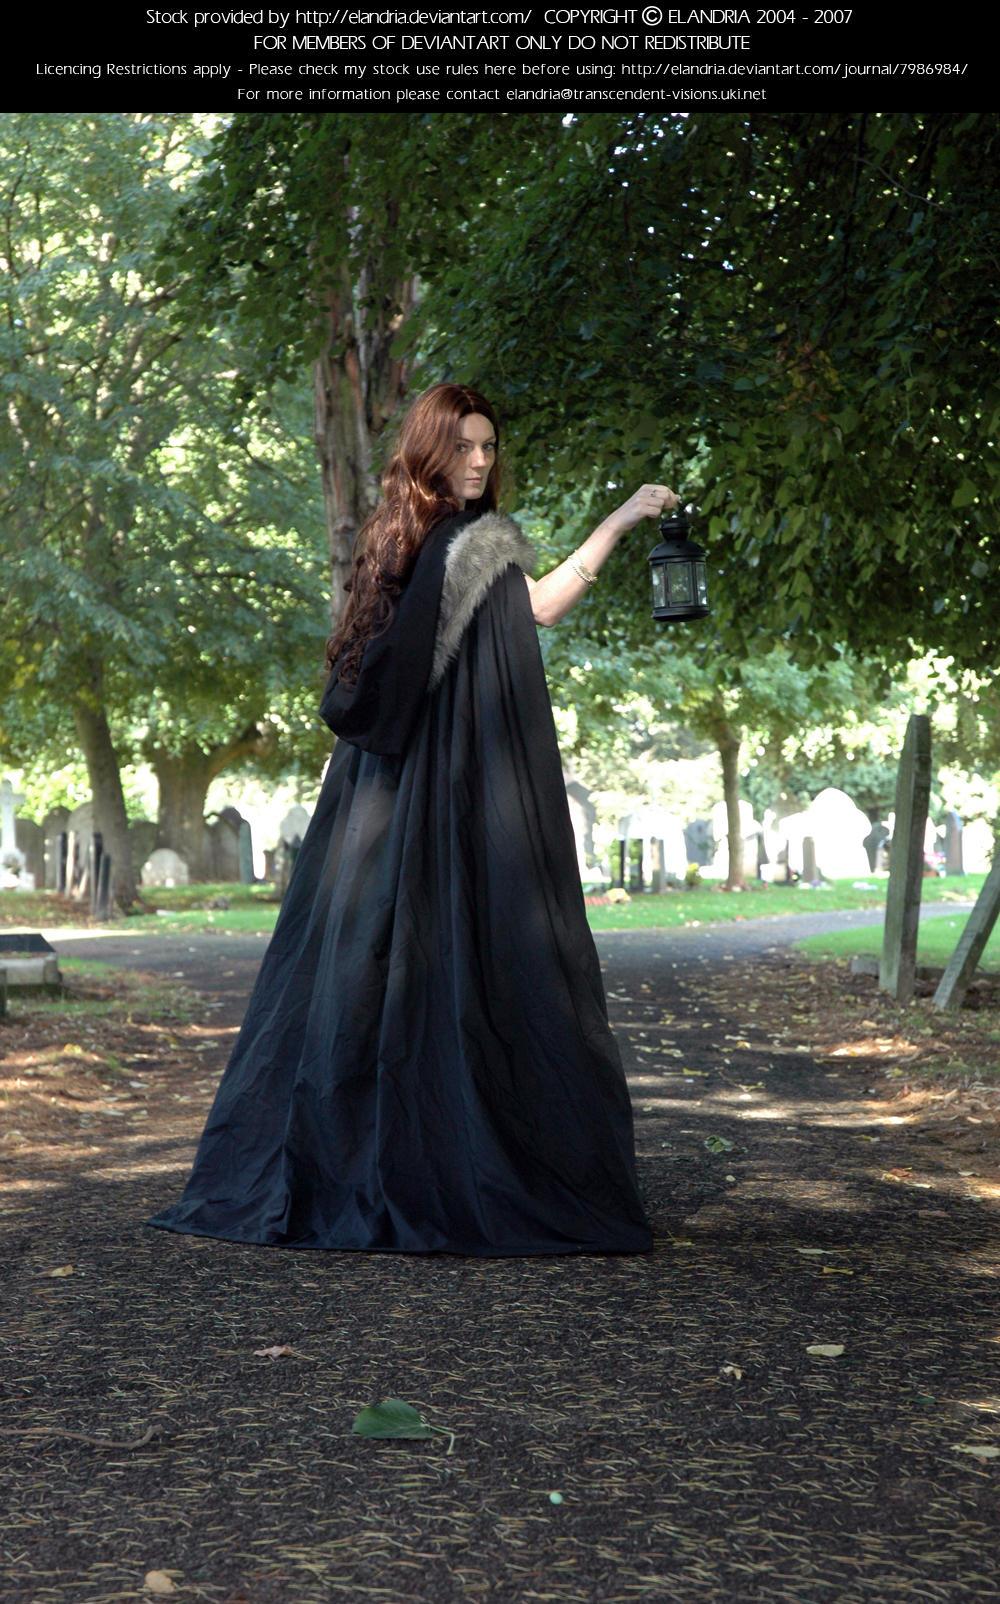 Victorian Ind 4 by Elandria